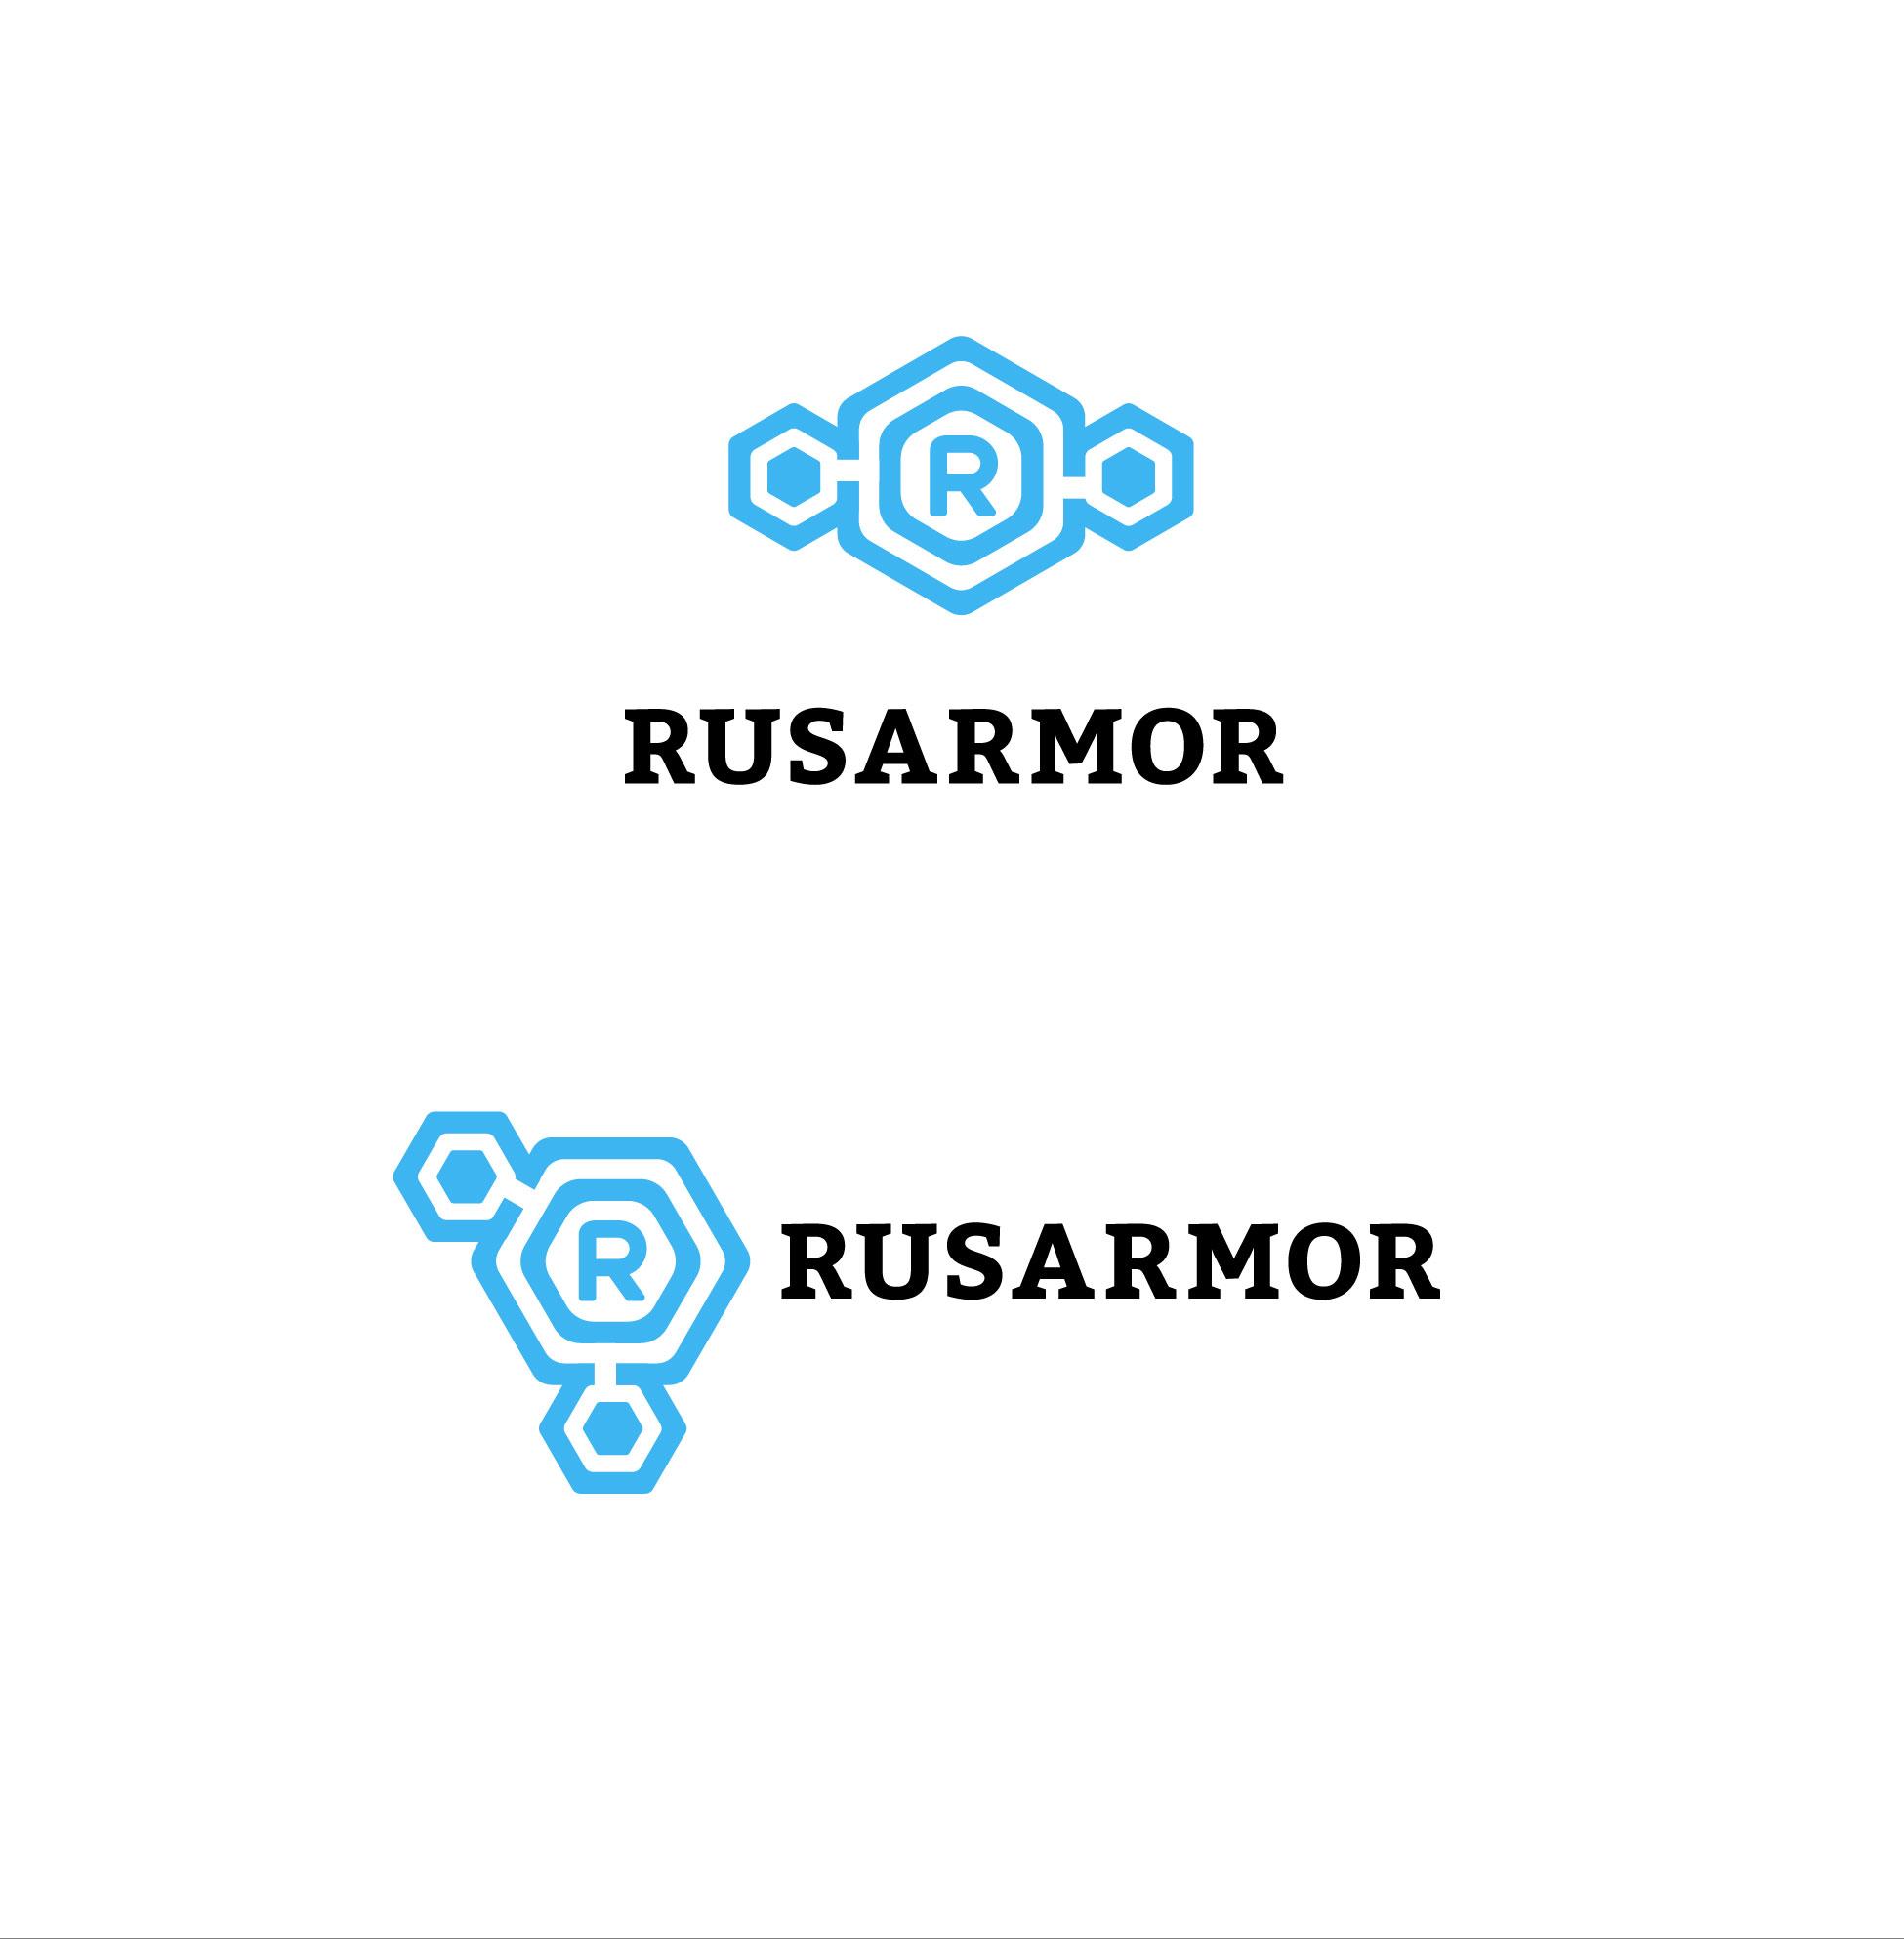 Разработка логотипа технологического стартапа РУСАРМОР фото f_8385a087d68ee047.jpg